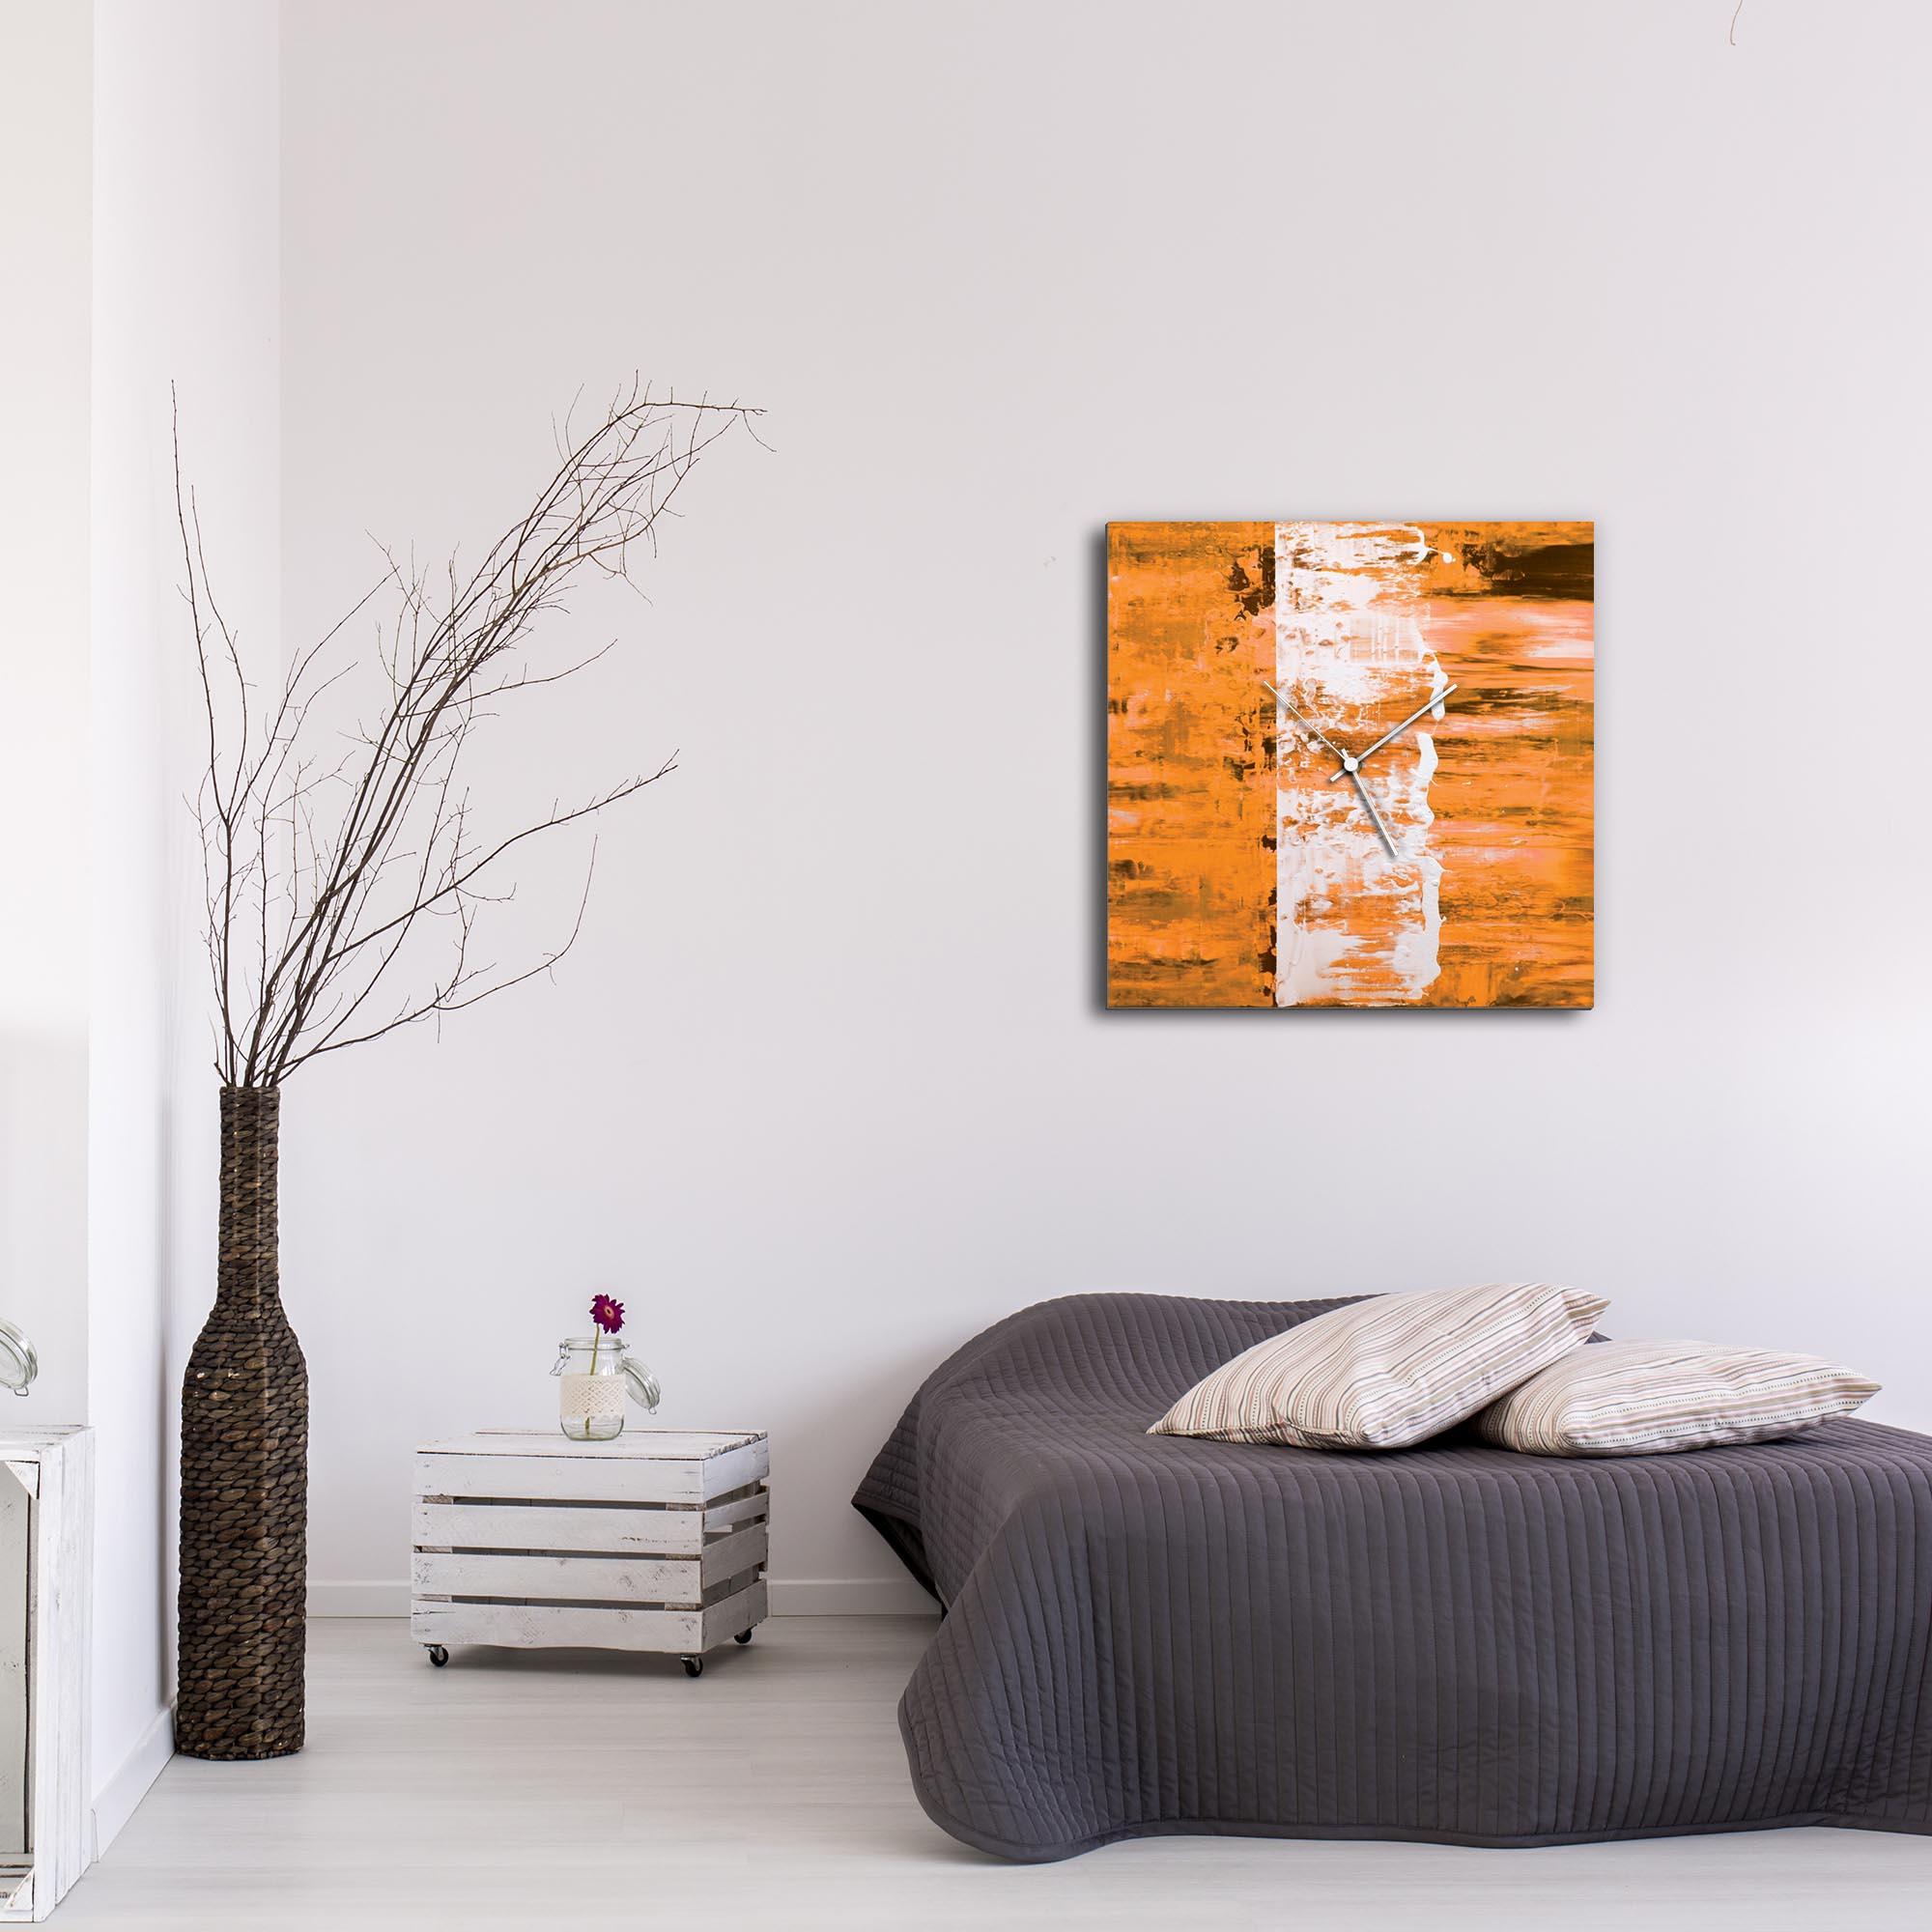 Orange Street Square Clock Large by Mendo Vasilevski - Urban Abstract Home Decor - Lifestyle View